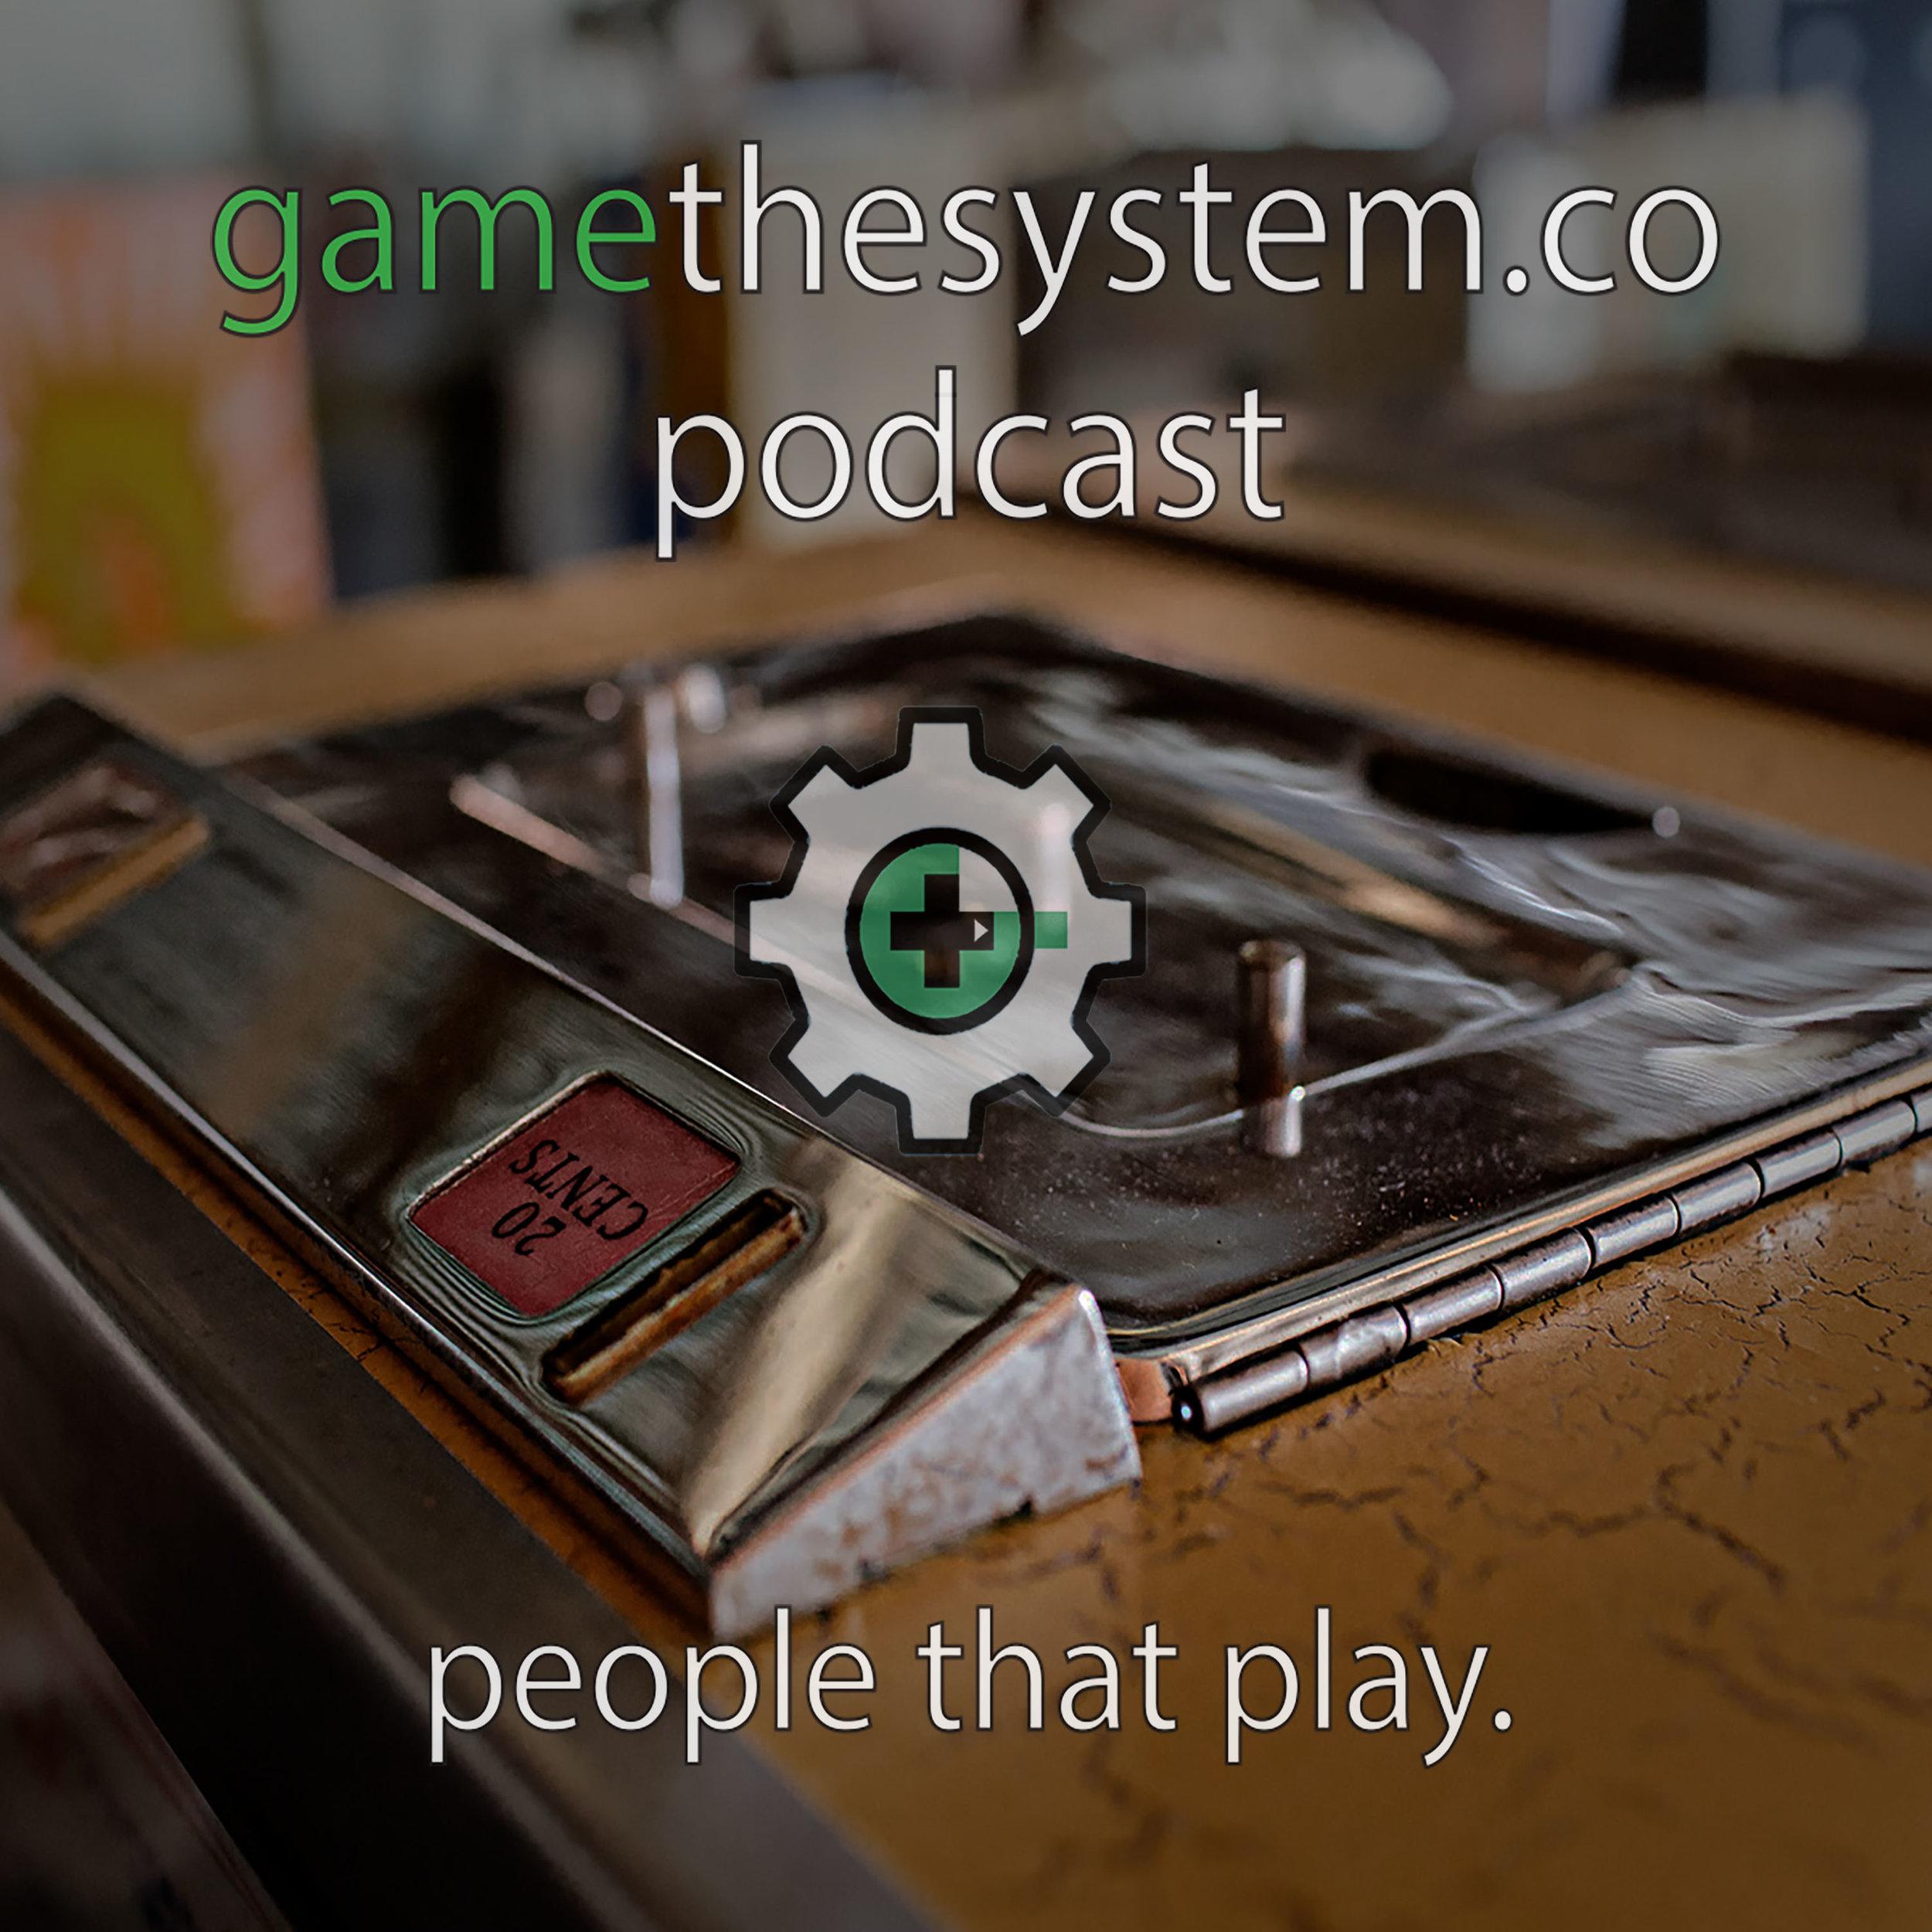 GametheSystemPodcast.jpg